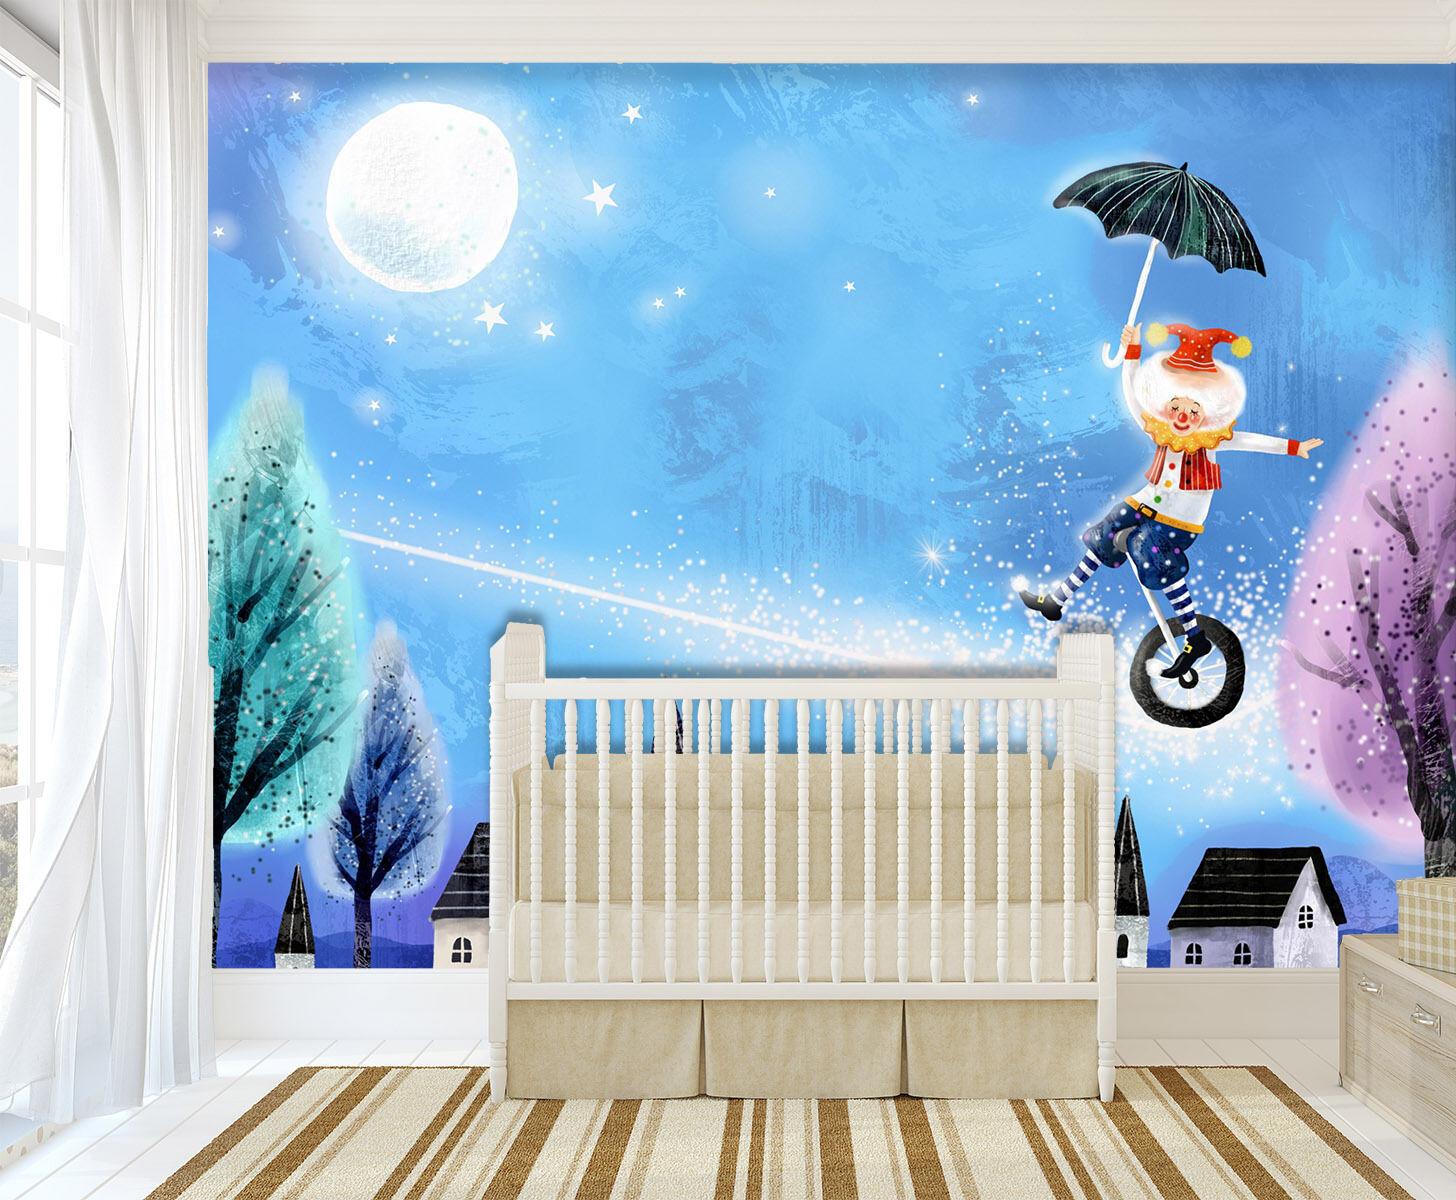 3D Funny Clowns 367 Wall Paper Wall Print Decal Wall Deco Indoor AJ Wall Paper